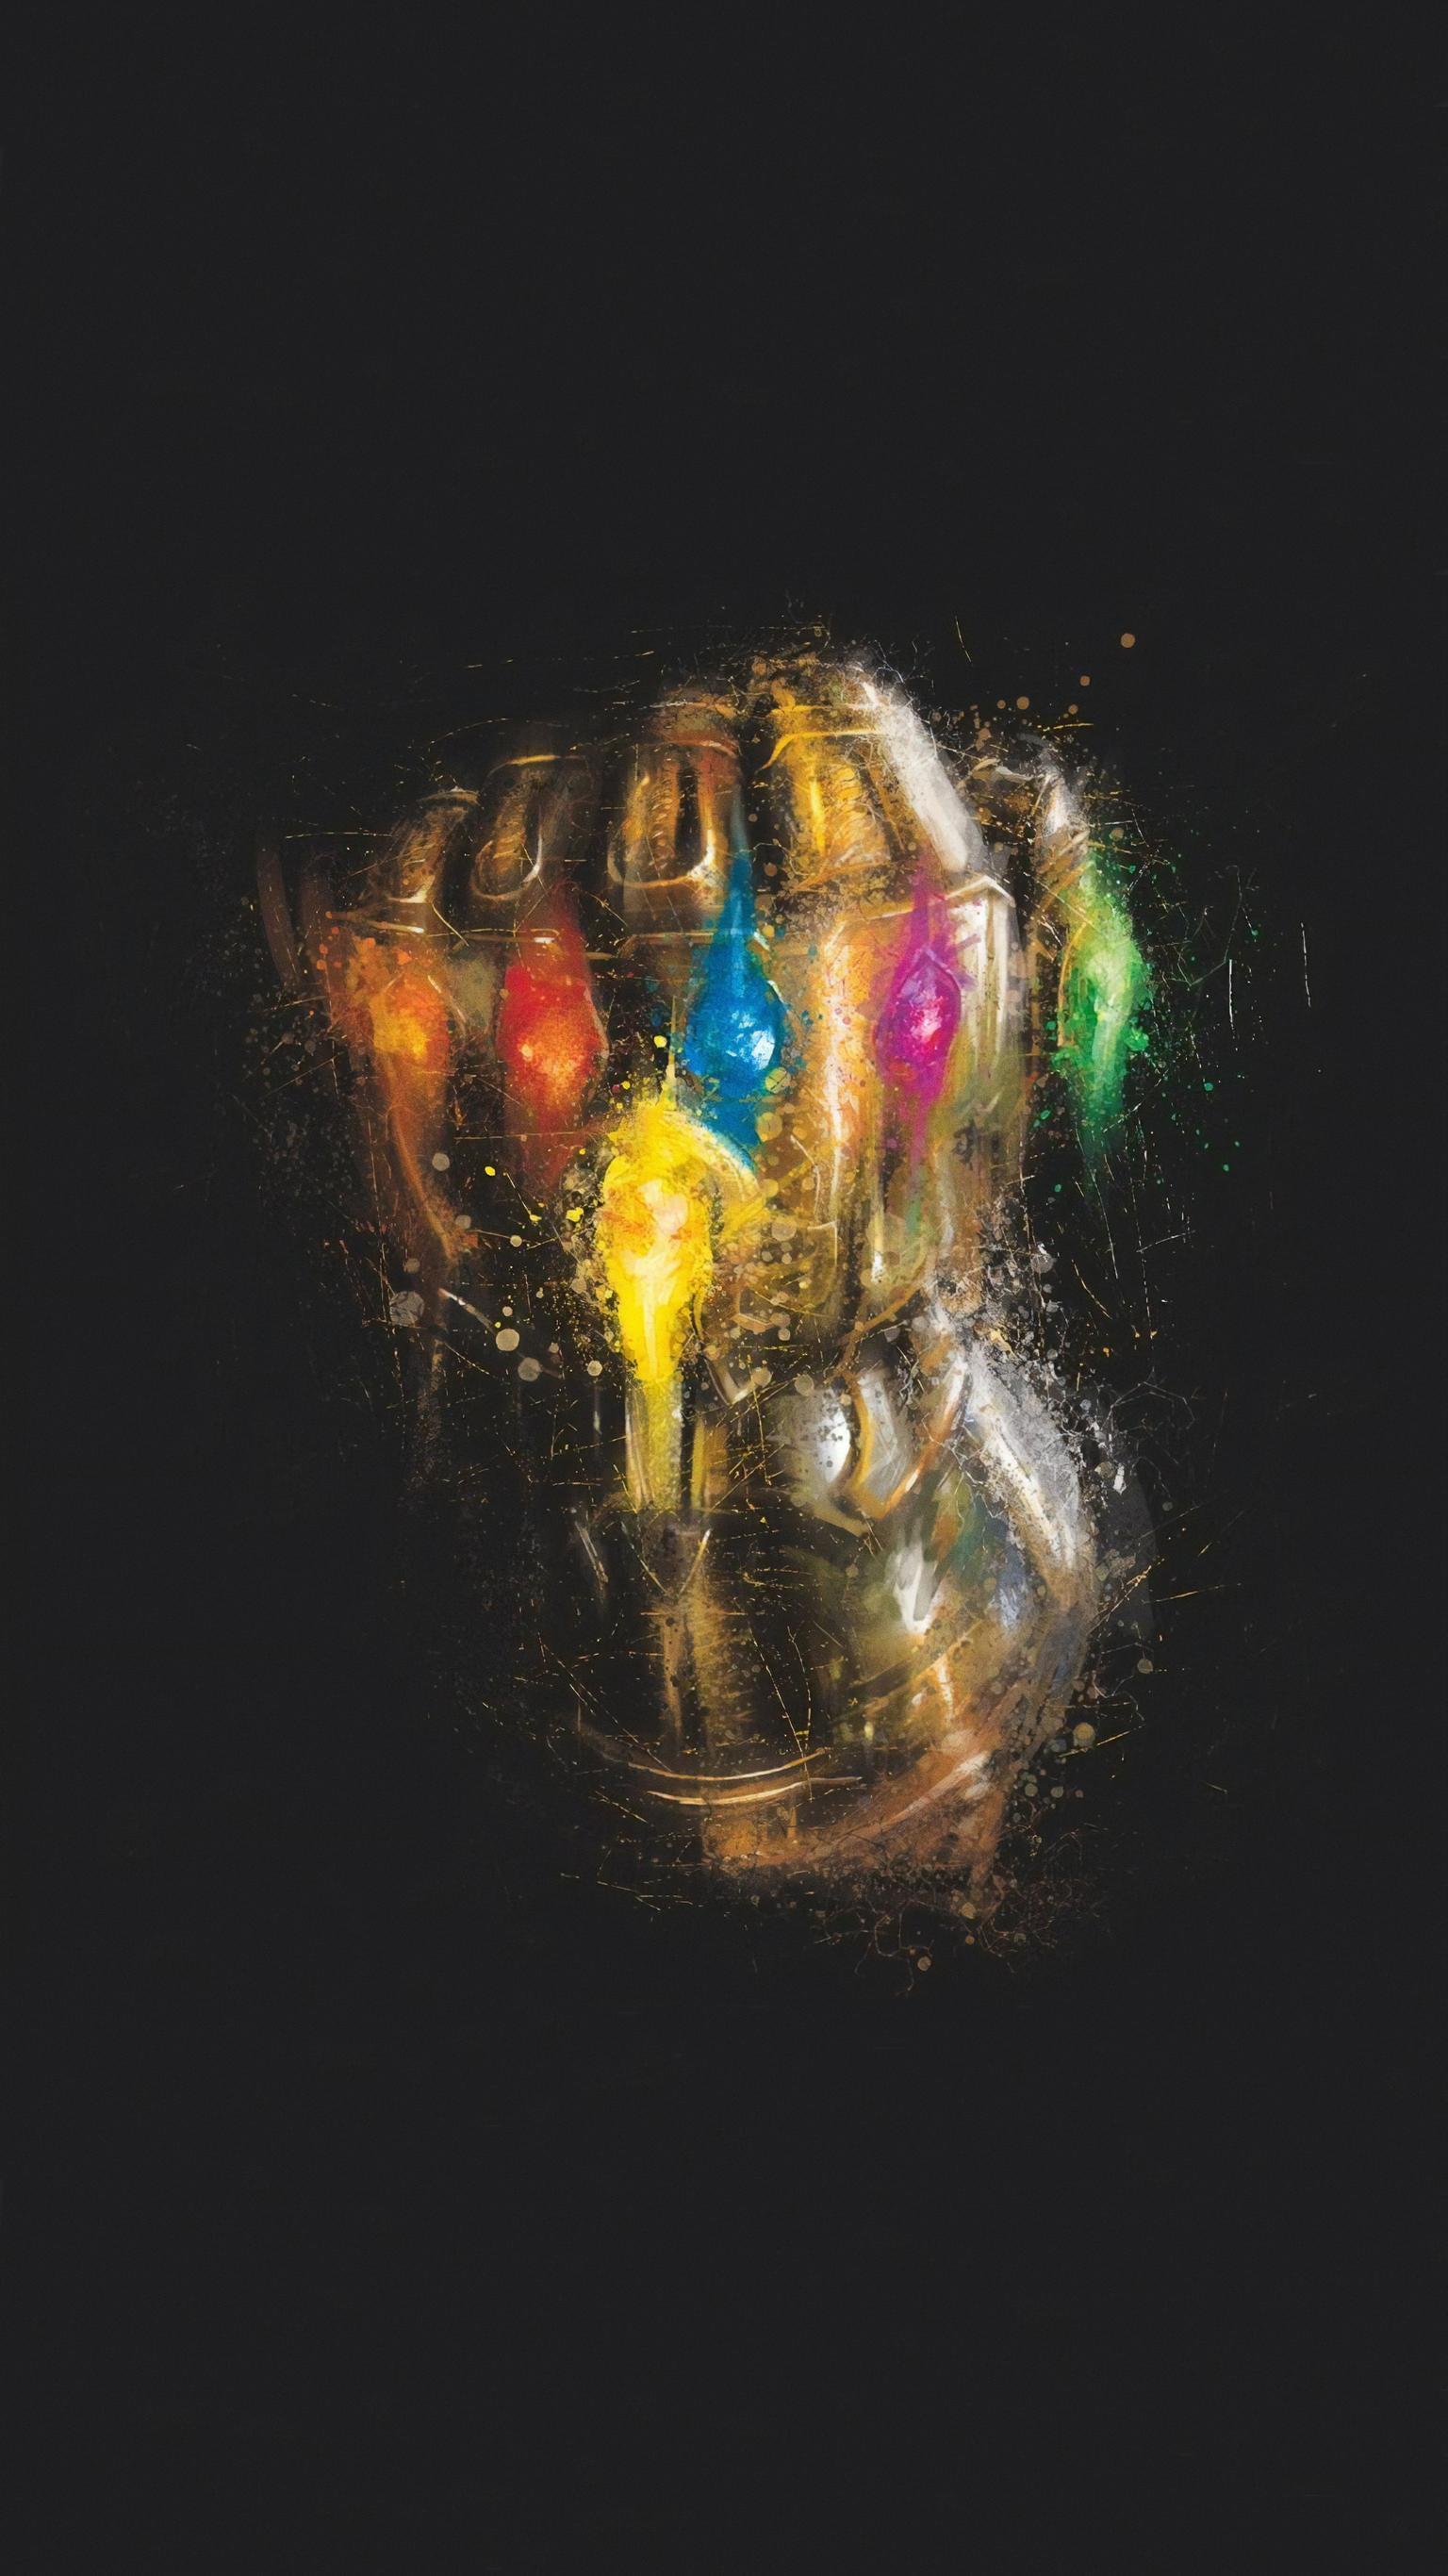 Avengers Endgame 2019 Phone Wallpaper Moviemania 1536x2732